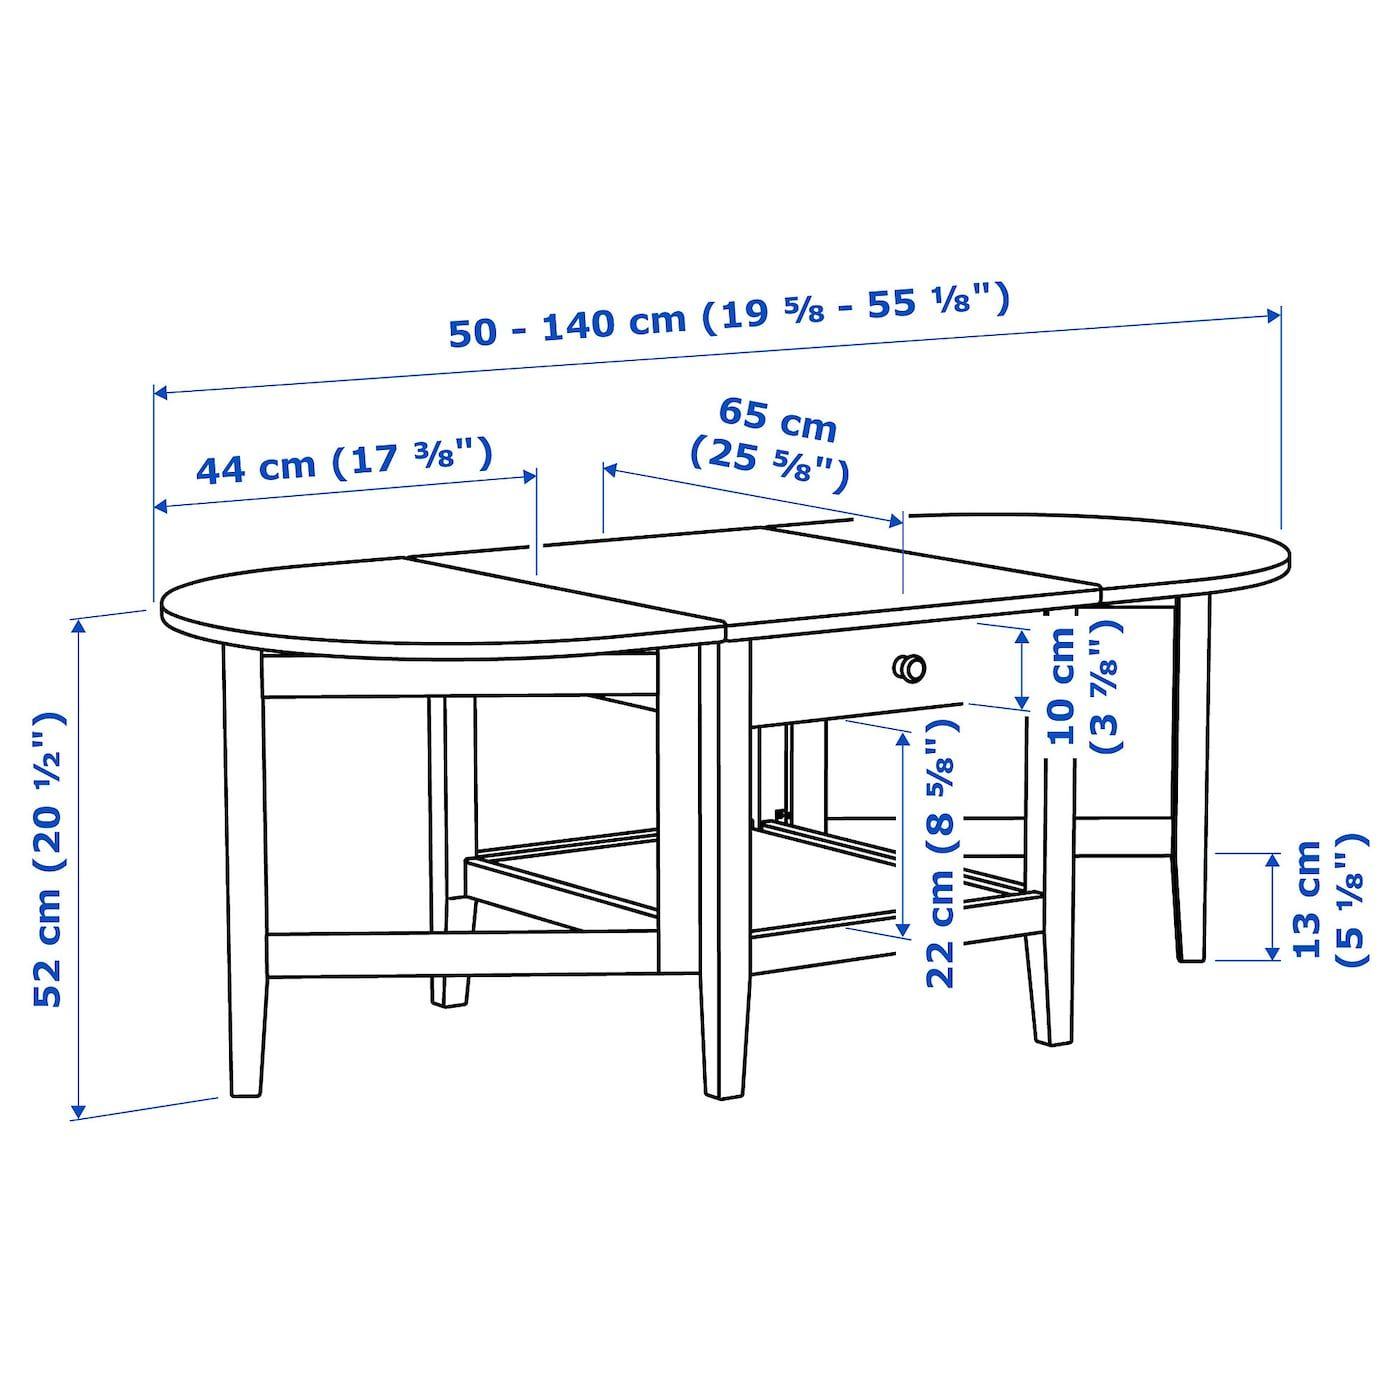 Arkelstorp Coffee Table Black Ikea In 2020 Coffee Table Wood Black Coffee Tables Coffee Table [ 1400 x 1400 Pixel ]